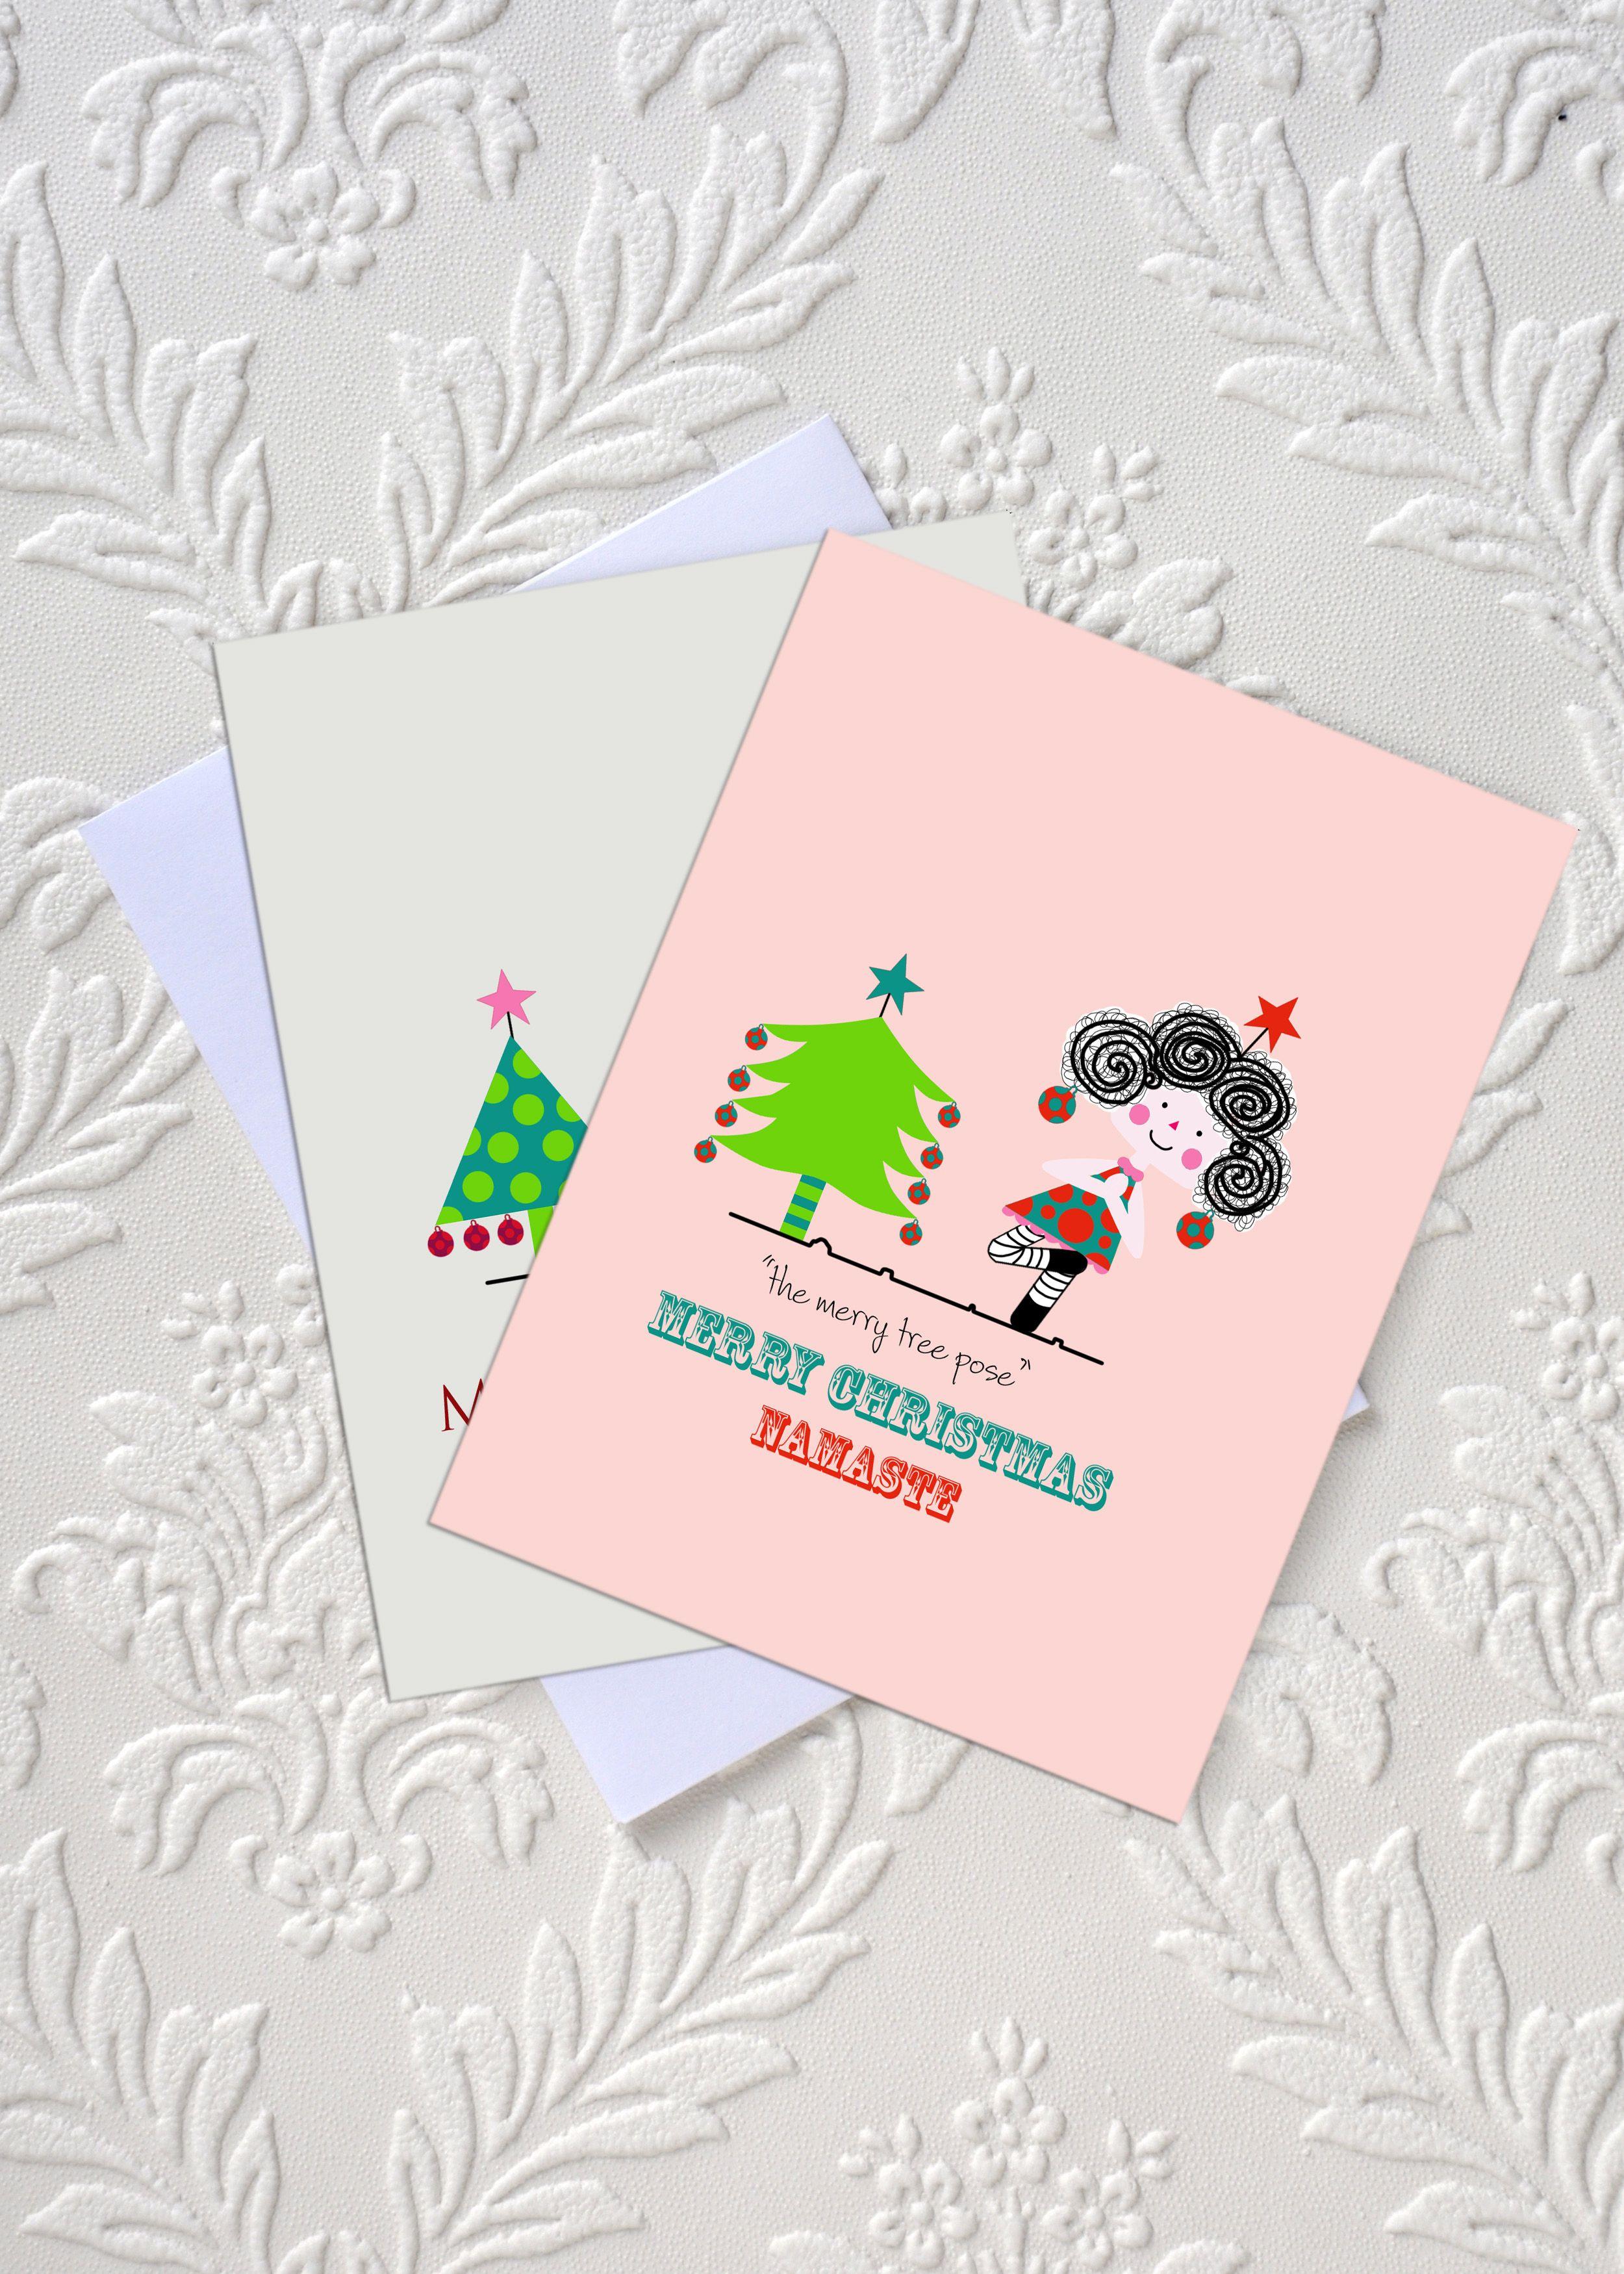 Yoga christmas greeting card the merry tree pose idocaredesigns yoga christmas greeting card the merry tree pose idocaredesigns design by m4hsunfo